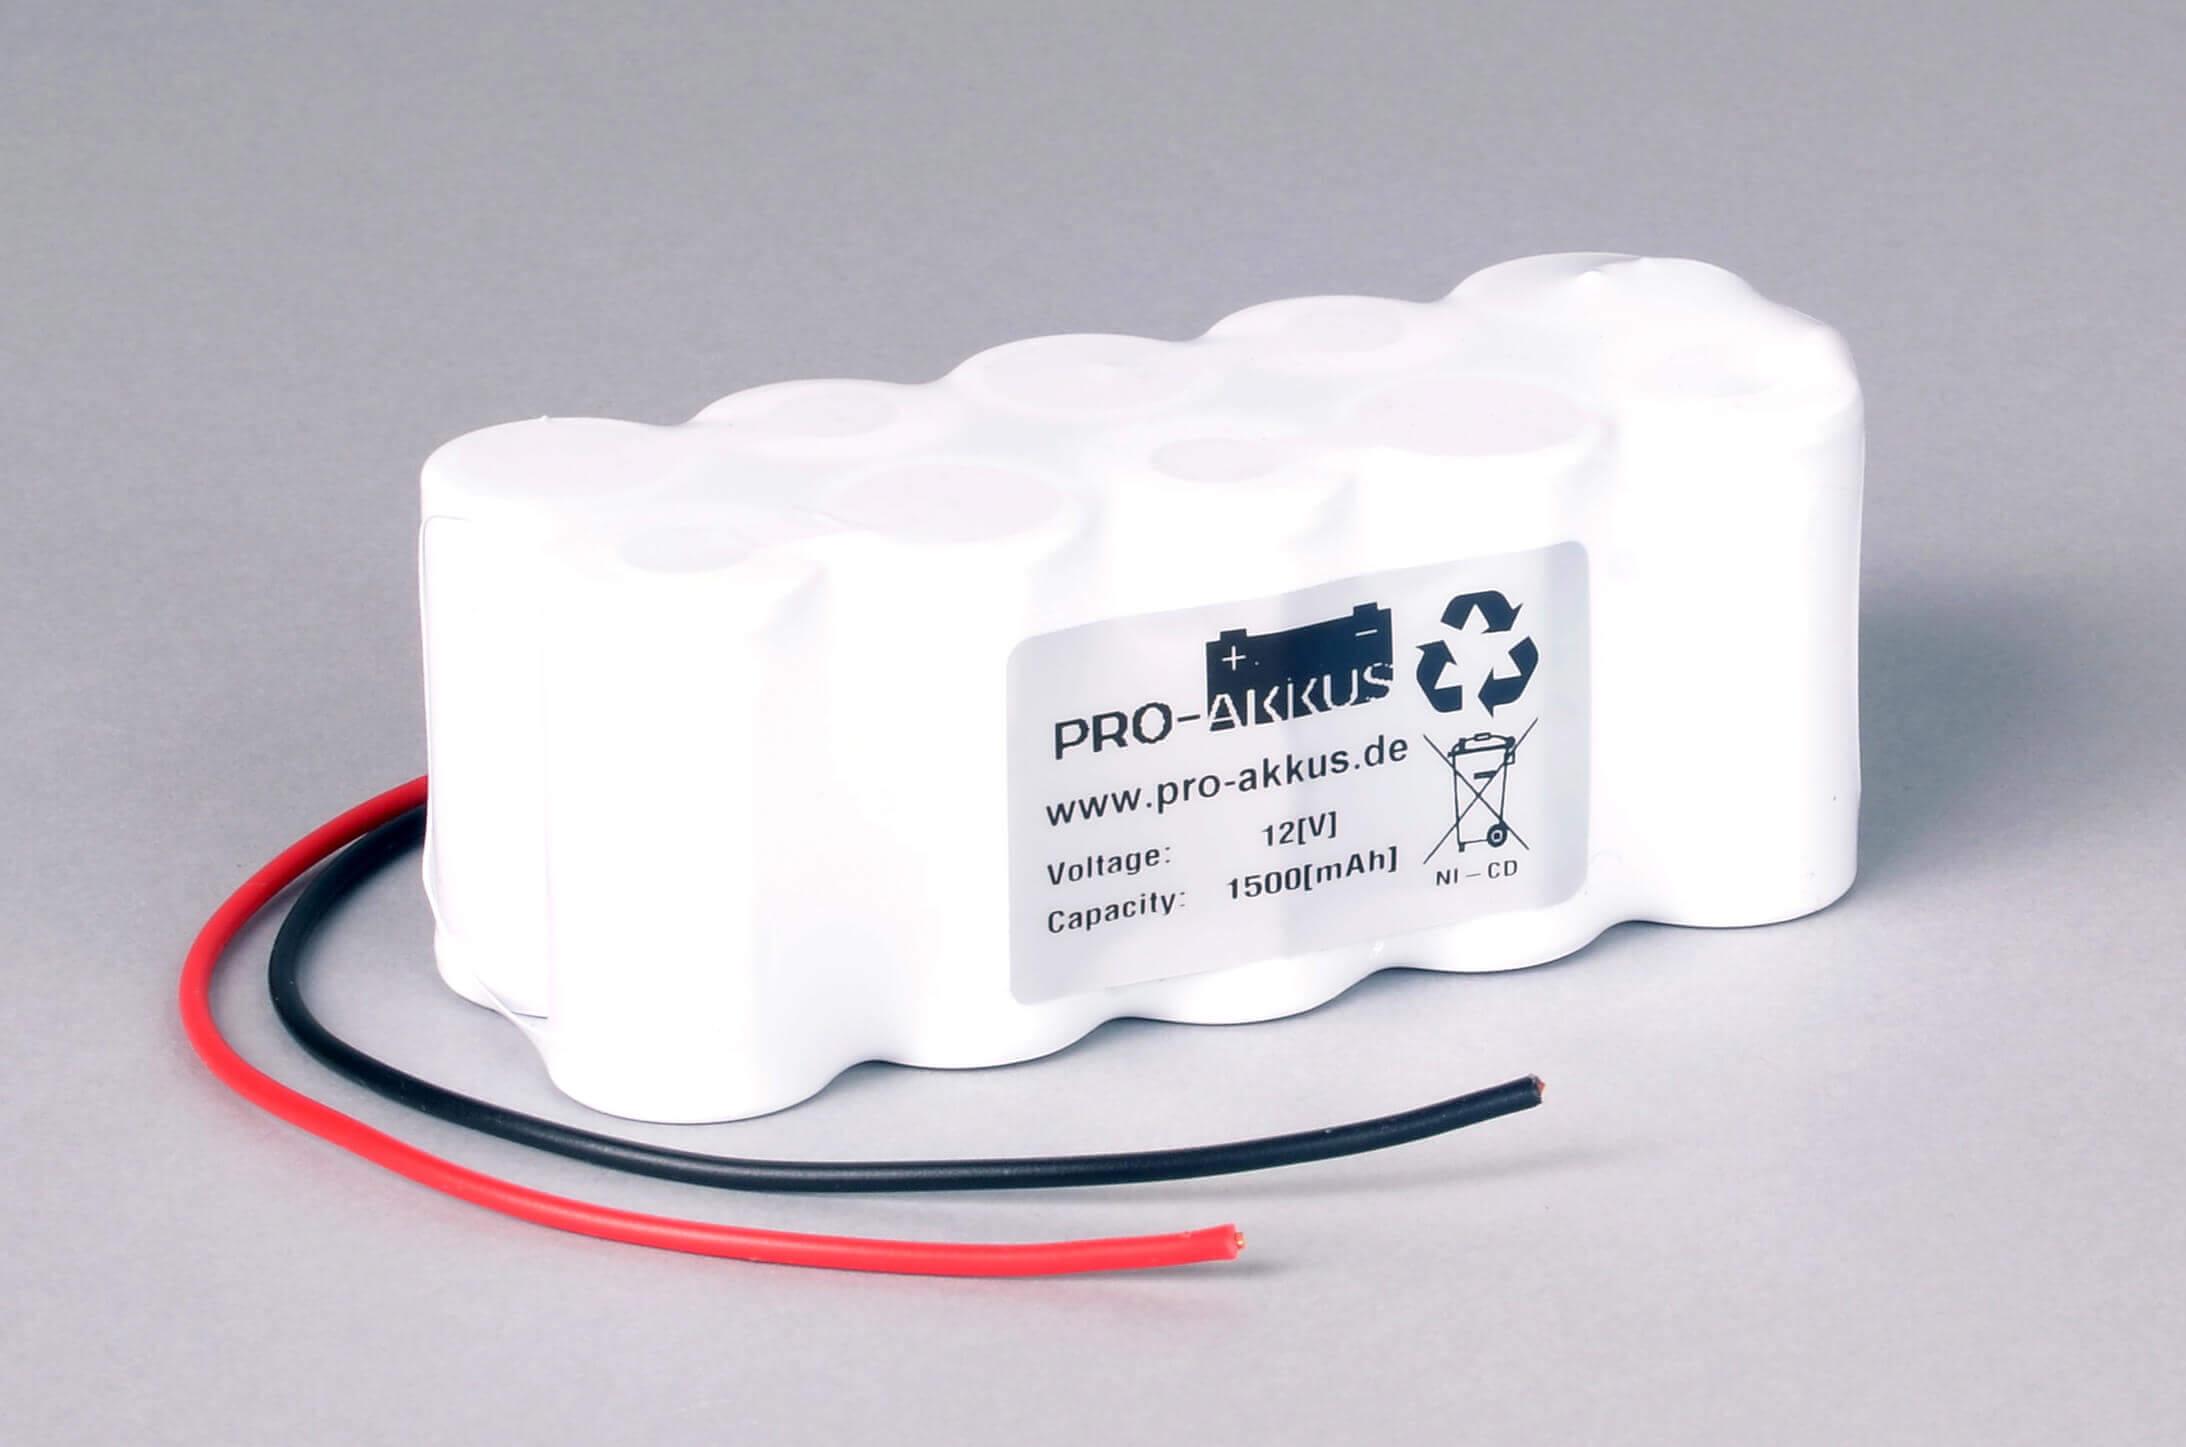 Ni-Cd Akkupack Notlicht Notbeleuchtung 12V / 1500mAh (1,5Ah) F5x2 Reihe mit Kabel